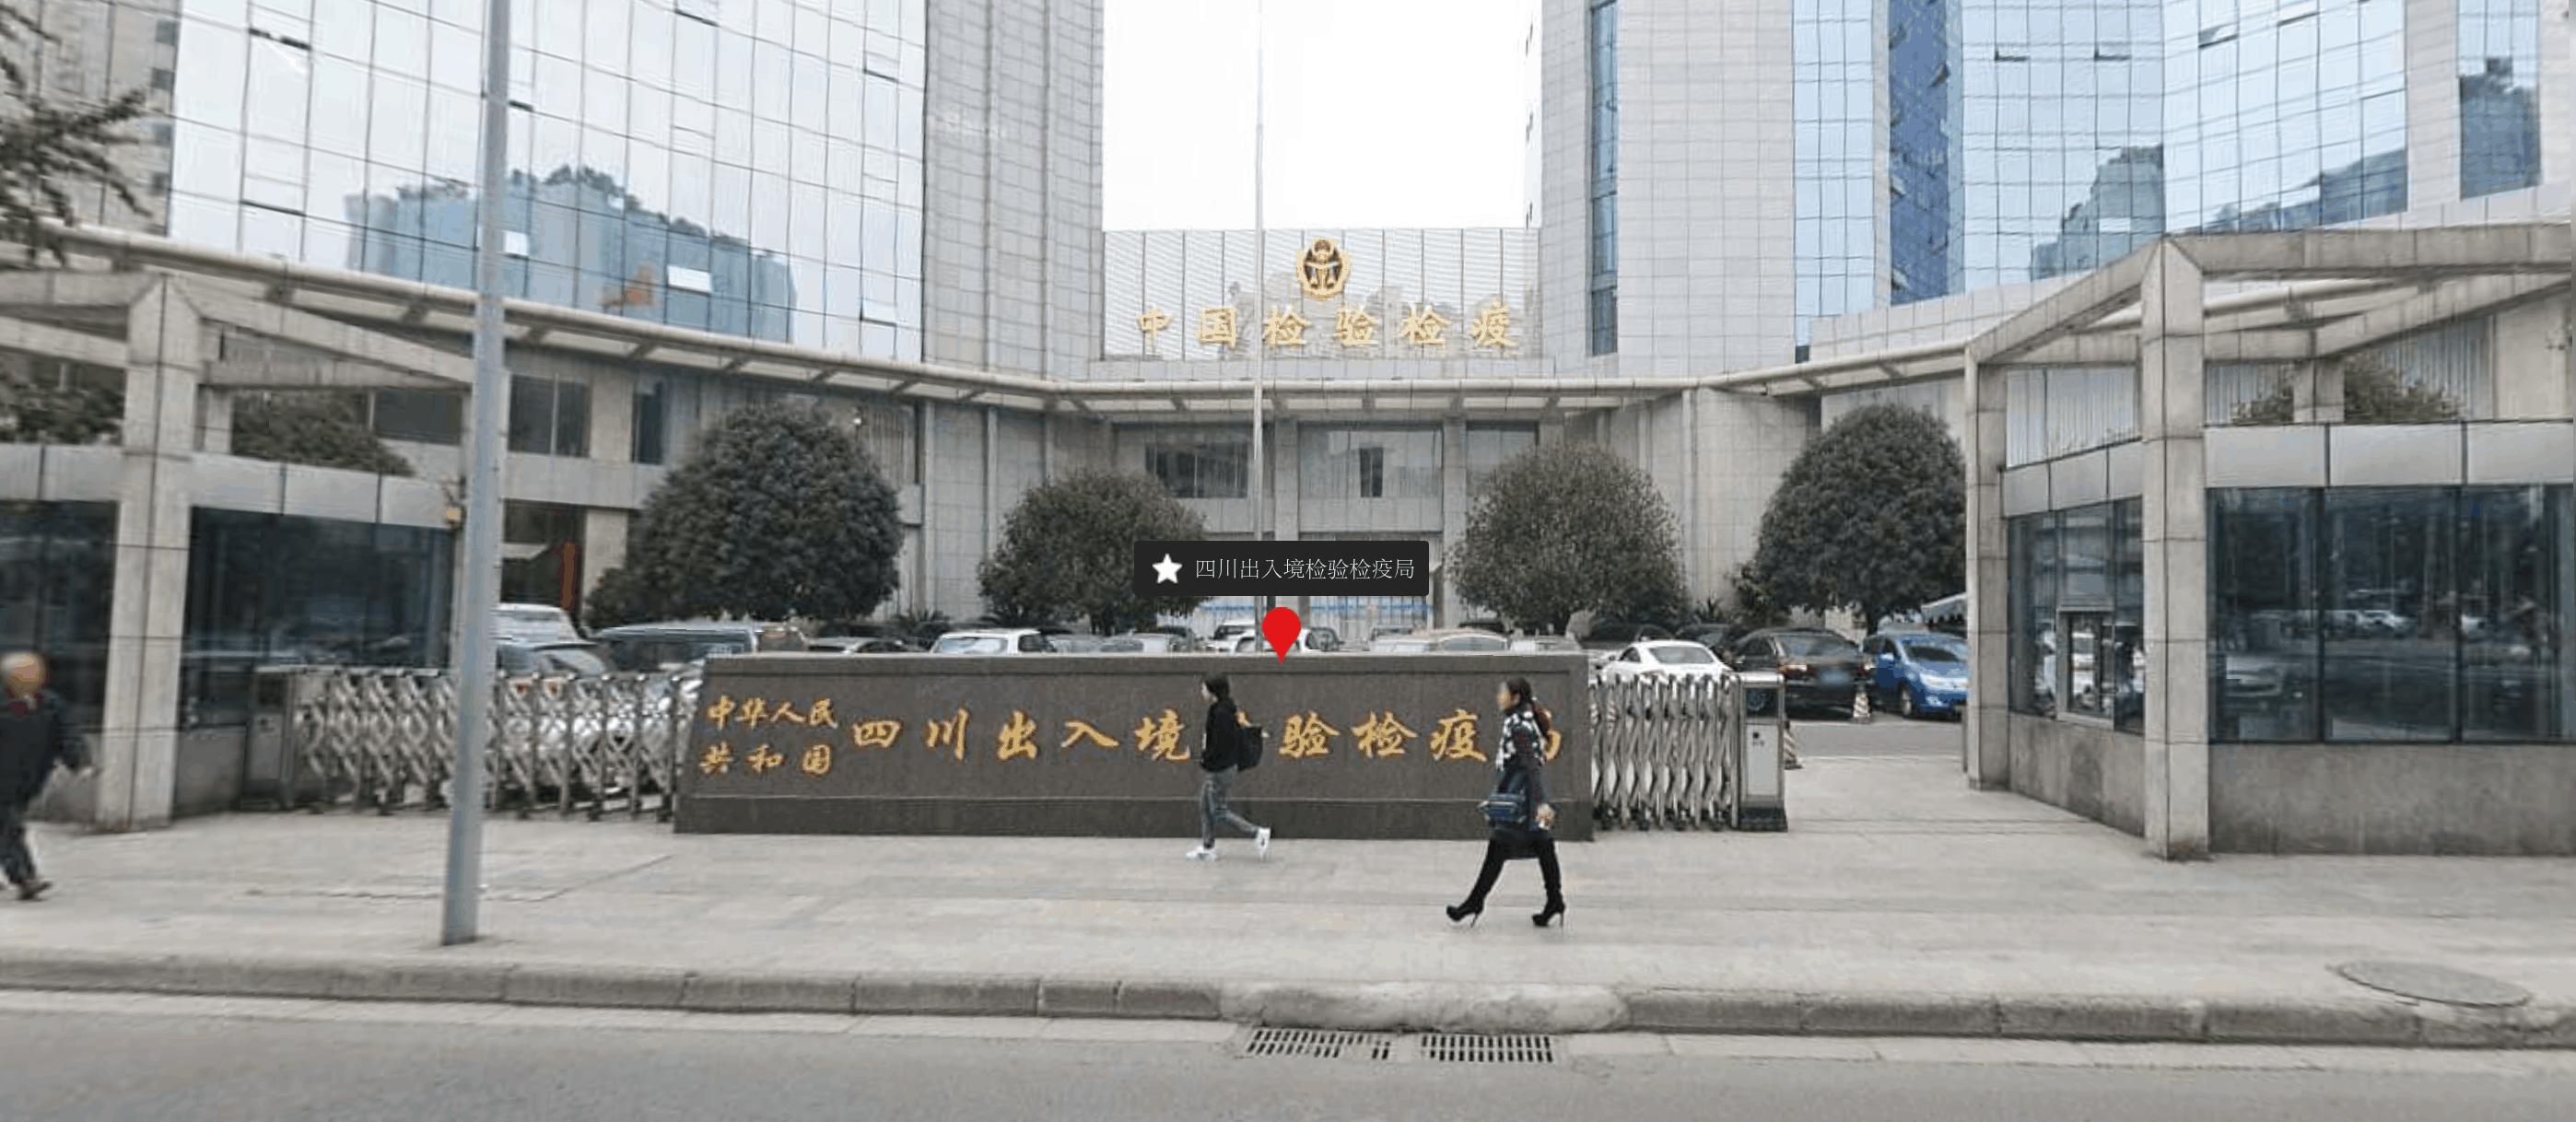 Sichuan Entry-Exit Inspection and Quarantine Bureau 四川省出入境检验检疫局